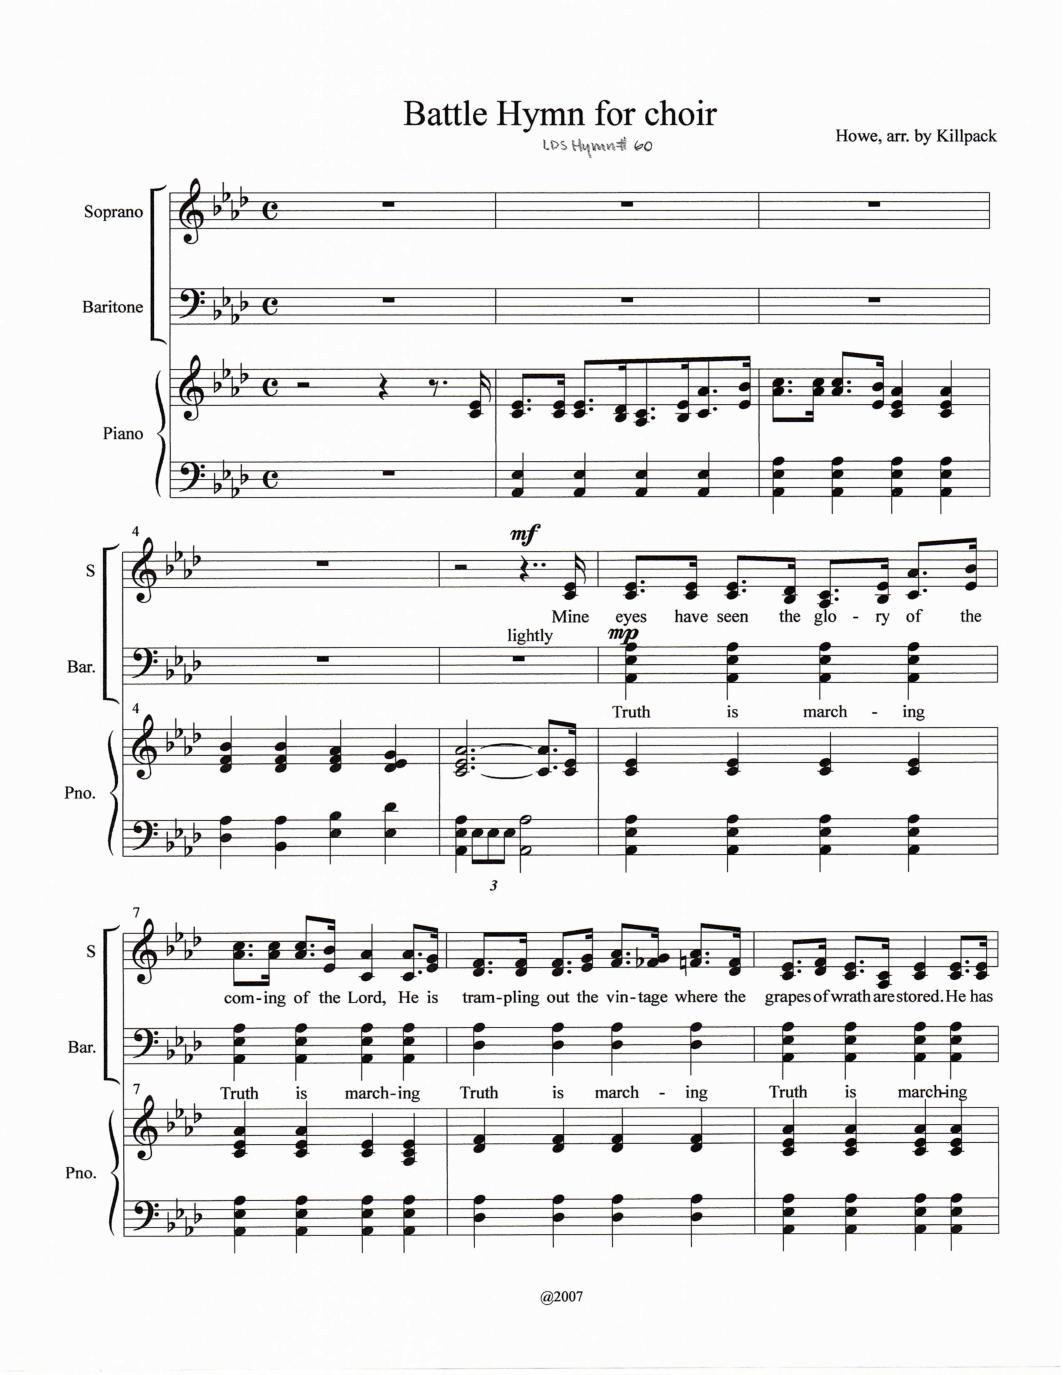 Battle Hymn of the Republic (William Steffe) - ChoralWiki